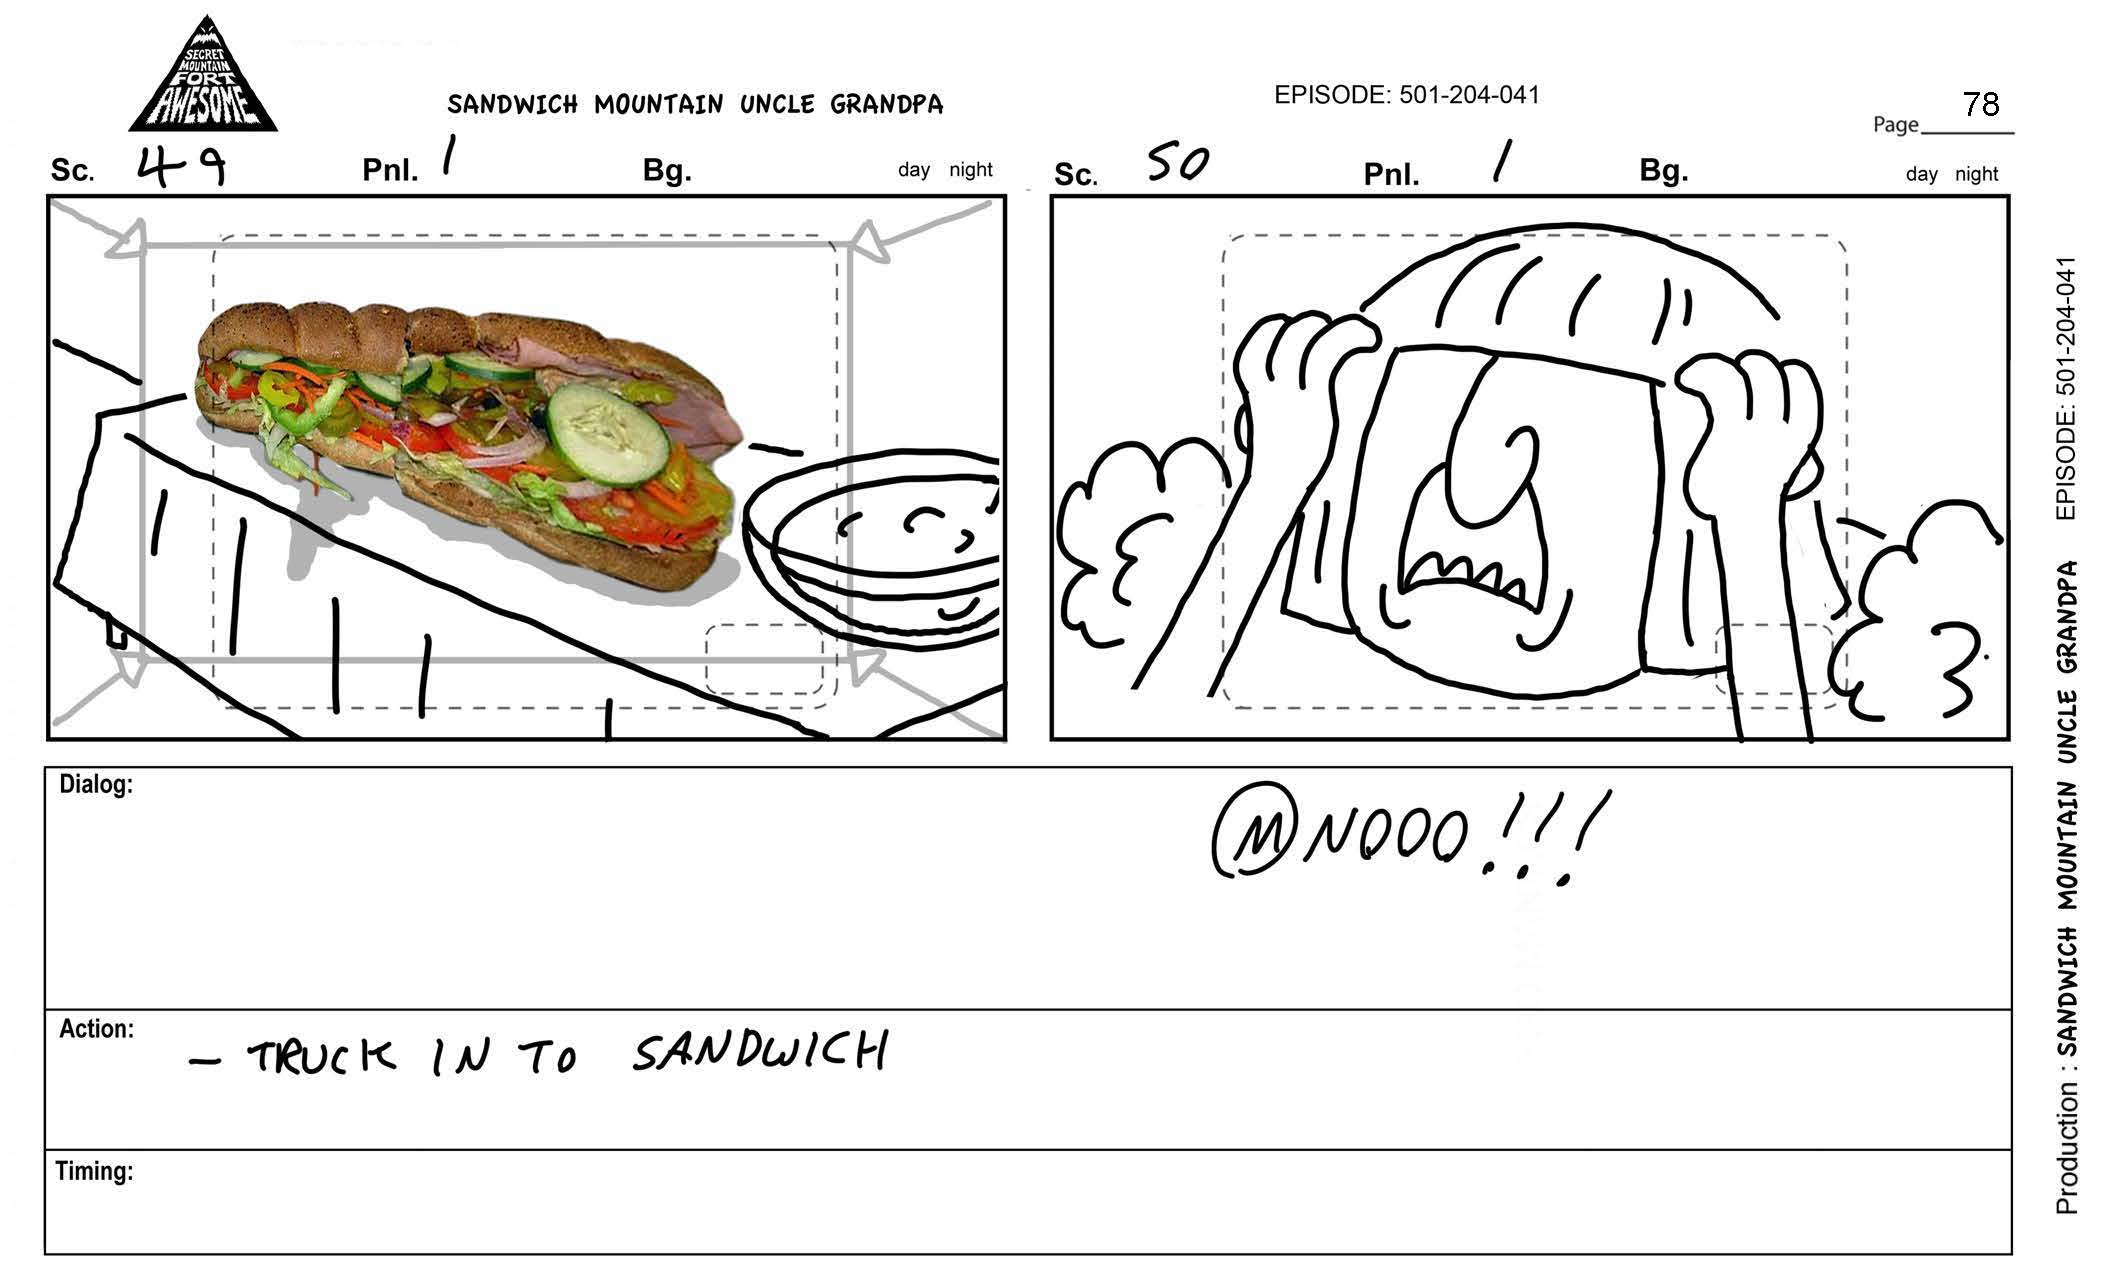 SMFA_SandwichMountainUncleGrandpa_Page_078.jpg